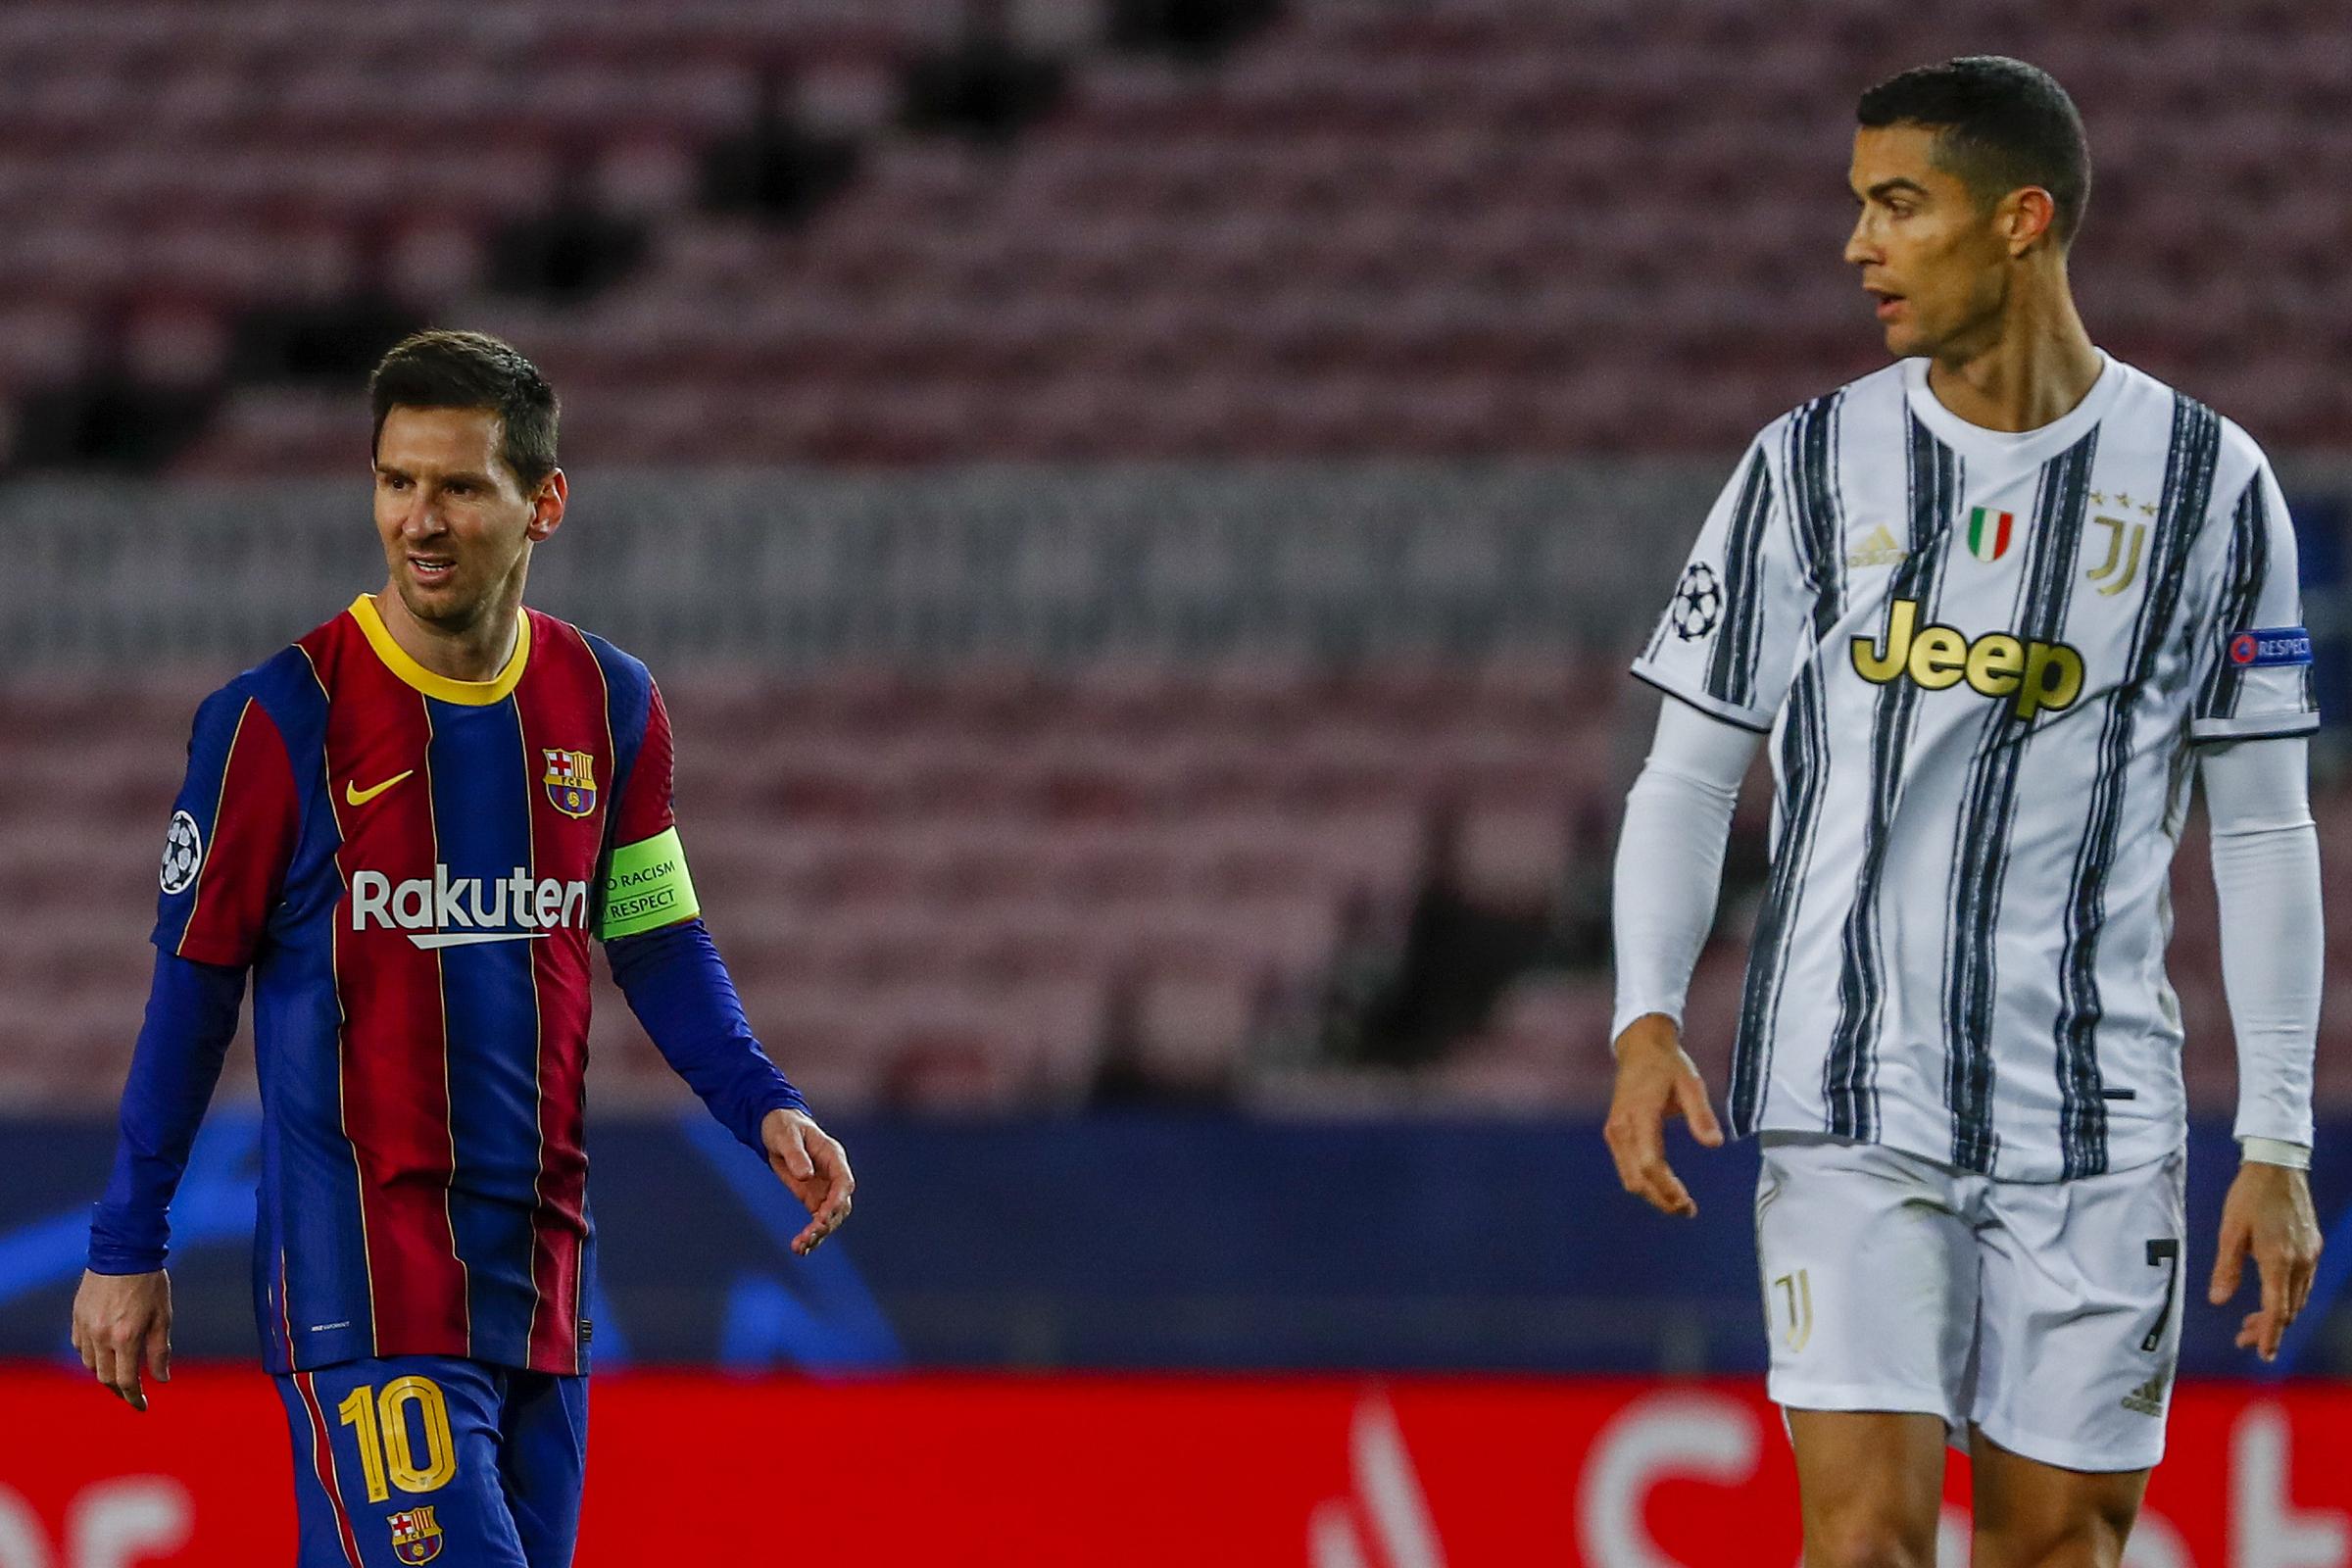 "Ronaldo และ Juventus เอาชนะ Barca ของ Messi 3-0 ที่ Camp Nou ในนัดสุดท้ายของรอบแบ่งกลุ่ม Champions League เมื่อวันที่ 8 ธันวาคม 2020  ภาพถ่าย: ""AP ."""